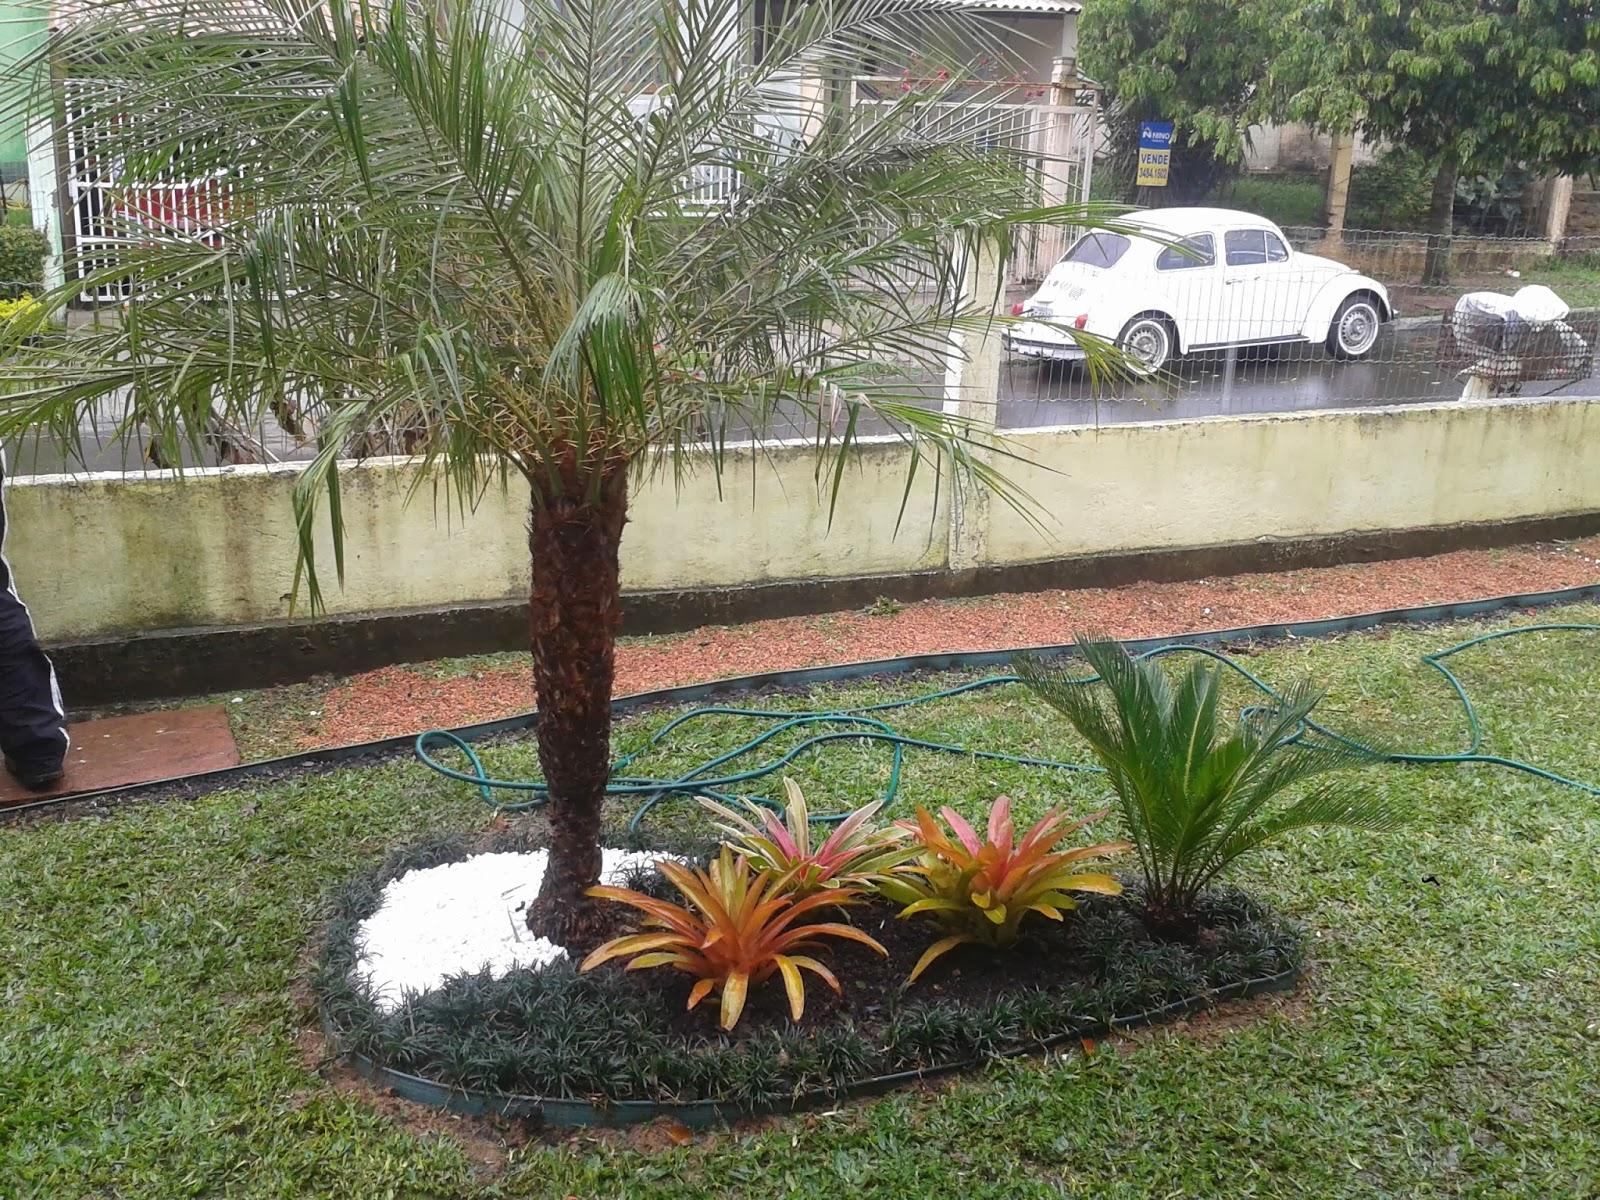 cerca para jardim alta : cerca para jardim alta:Art Verde: Jardim e Cerca Sr Taís Parada- 92 Gravatai